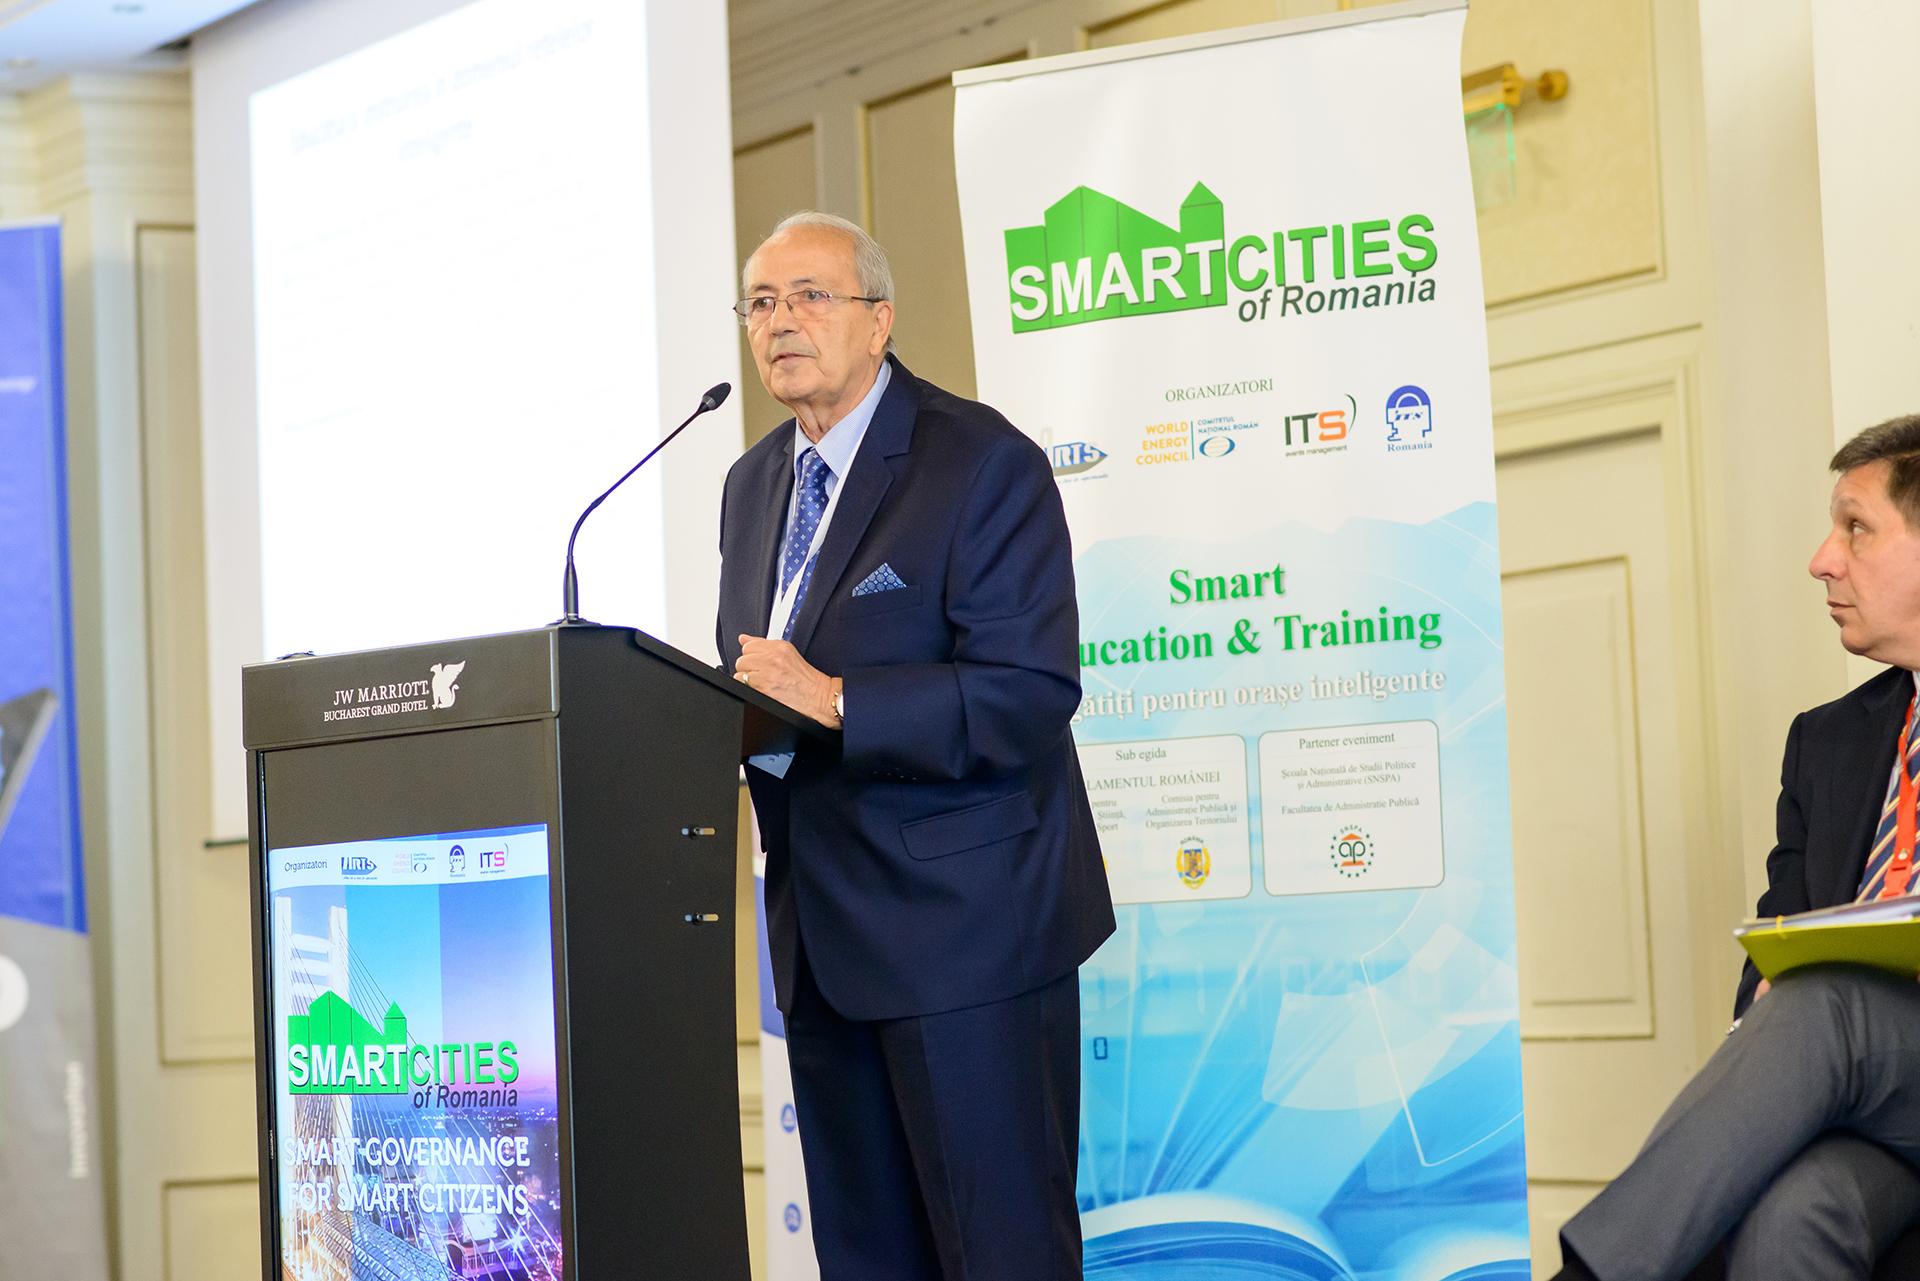 Smart-Cities-Of-Romania-2017---ITS2-306